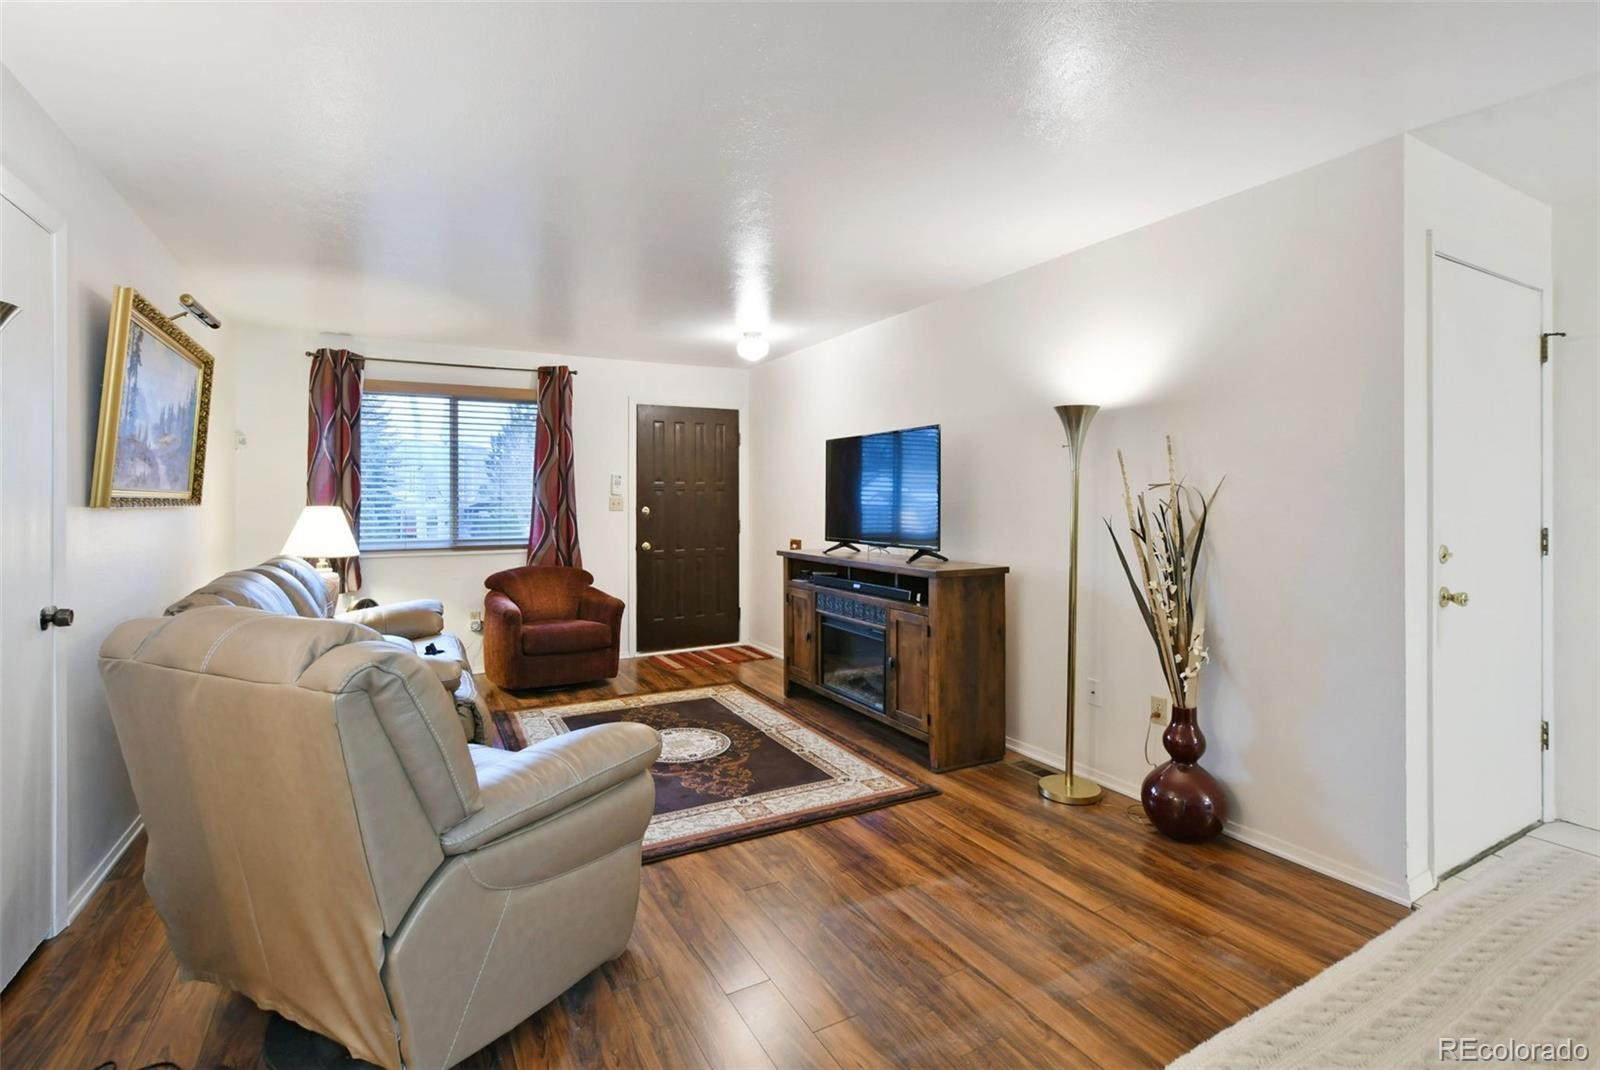 MLS# 9707677 - 6 - 712 Gardenia Street, Golden, CO 80401